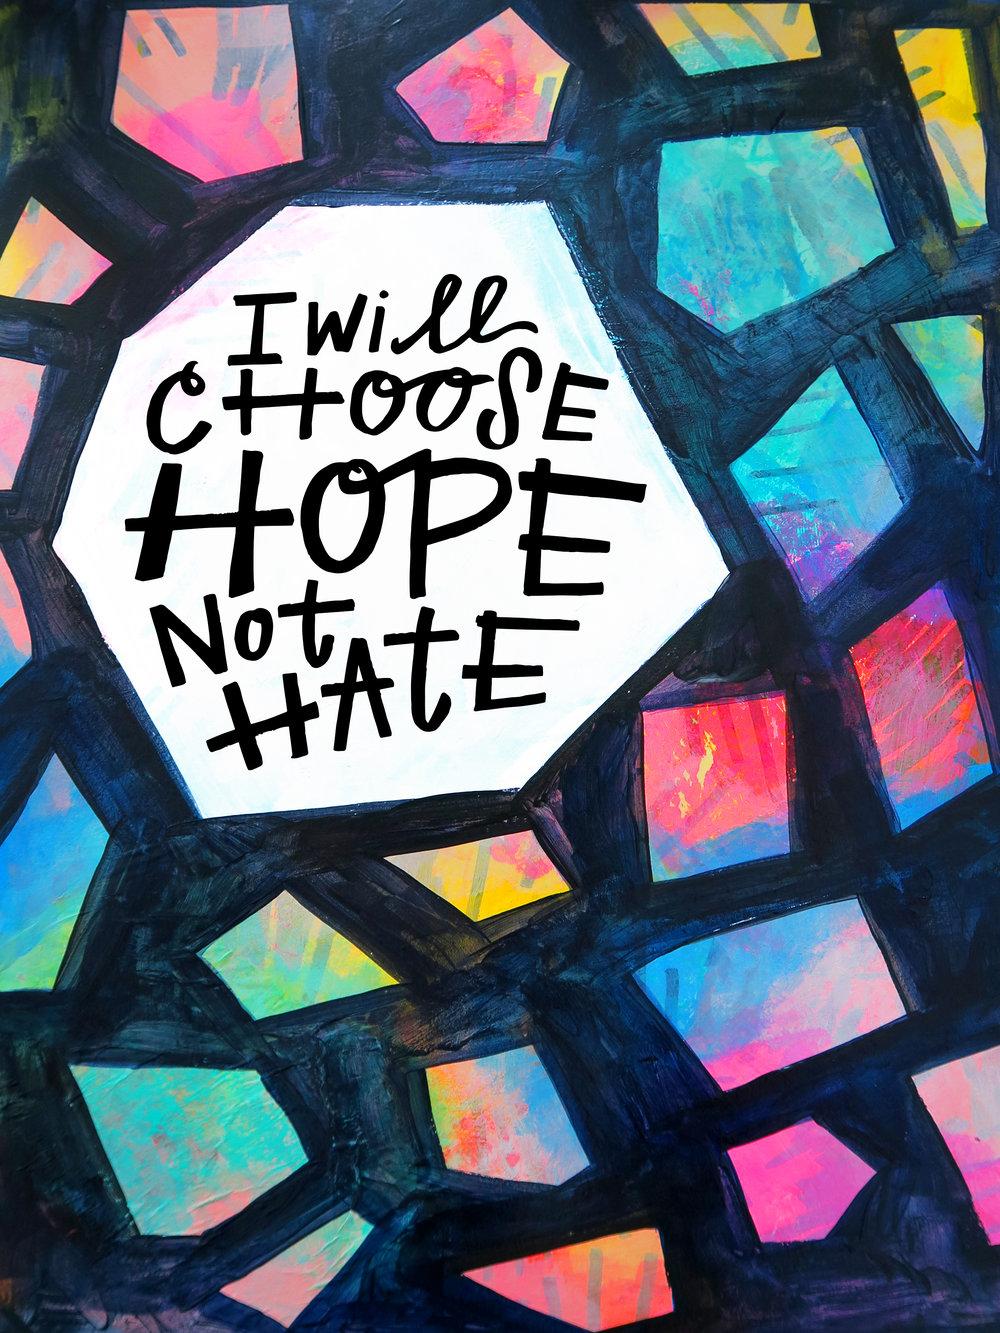 7/8/16: Hope